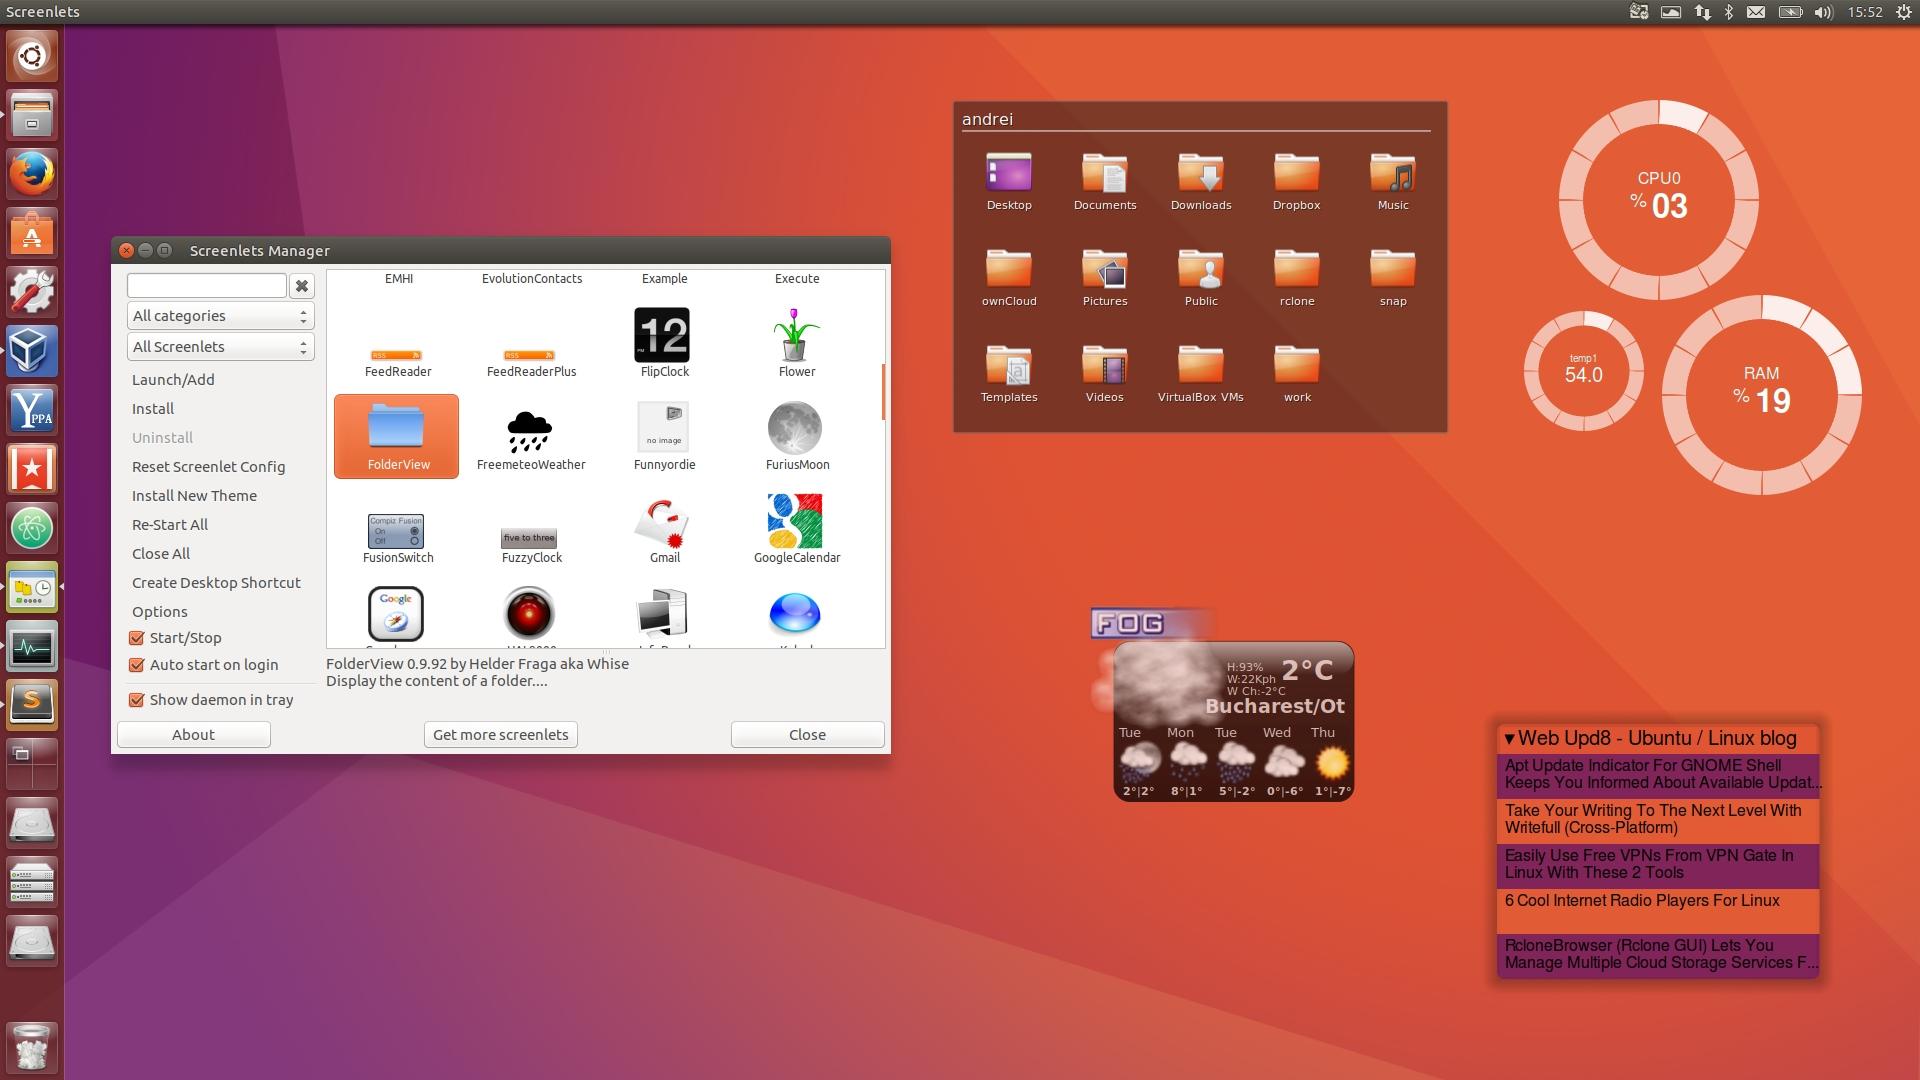 Screenlets (Desktop Widgets) Fixed For Ubuntu 16.04, Available In_Countdown Calendar Gadget Windows 7